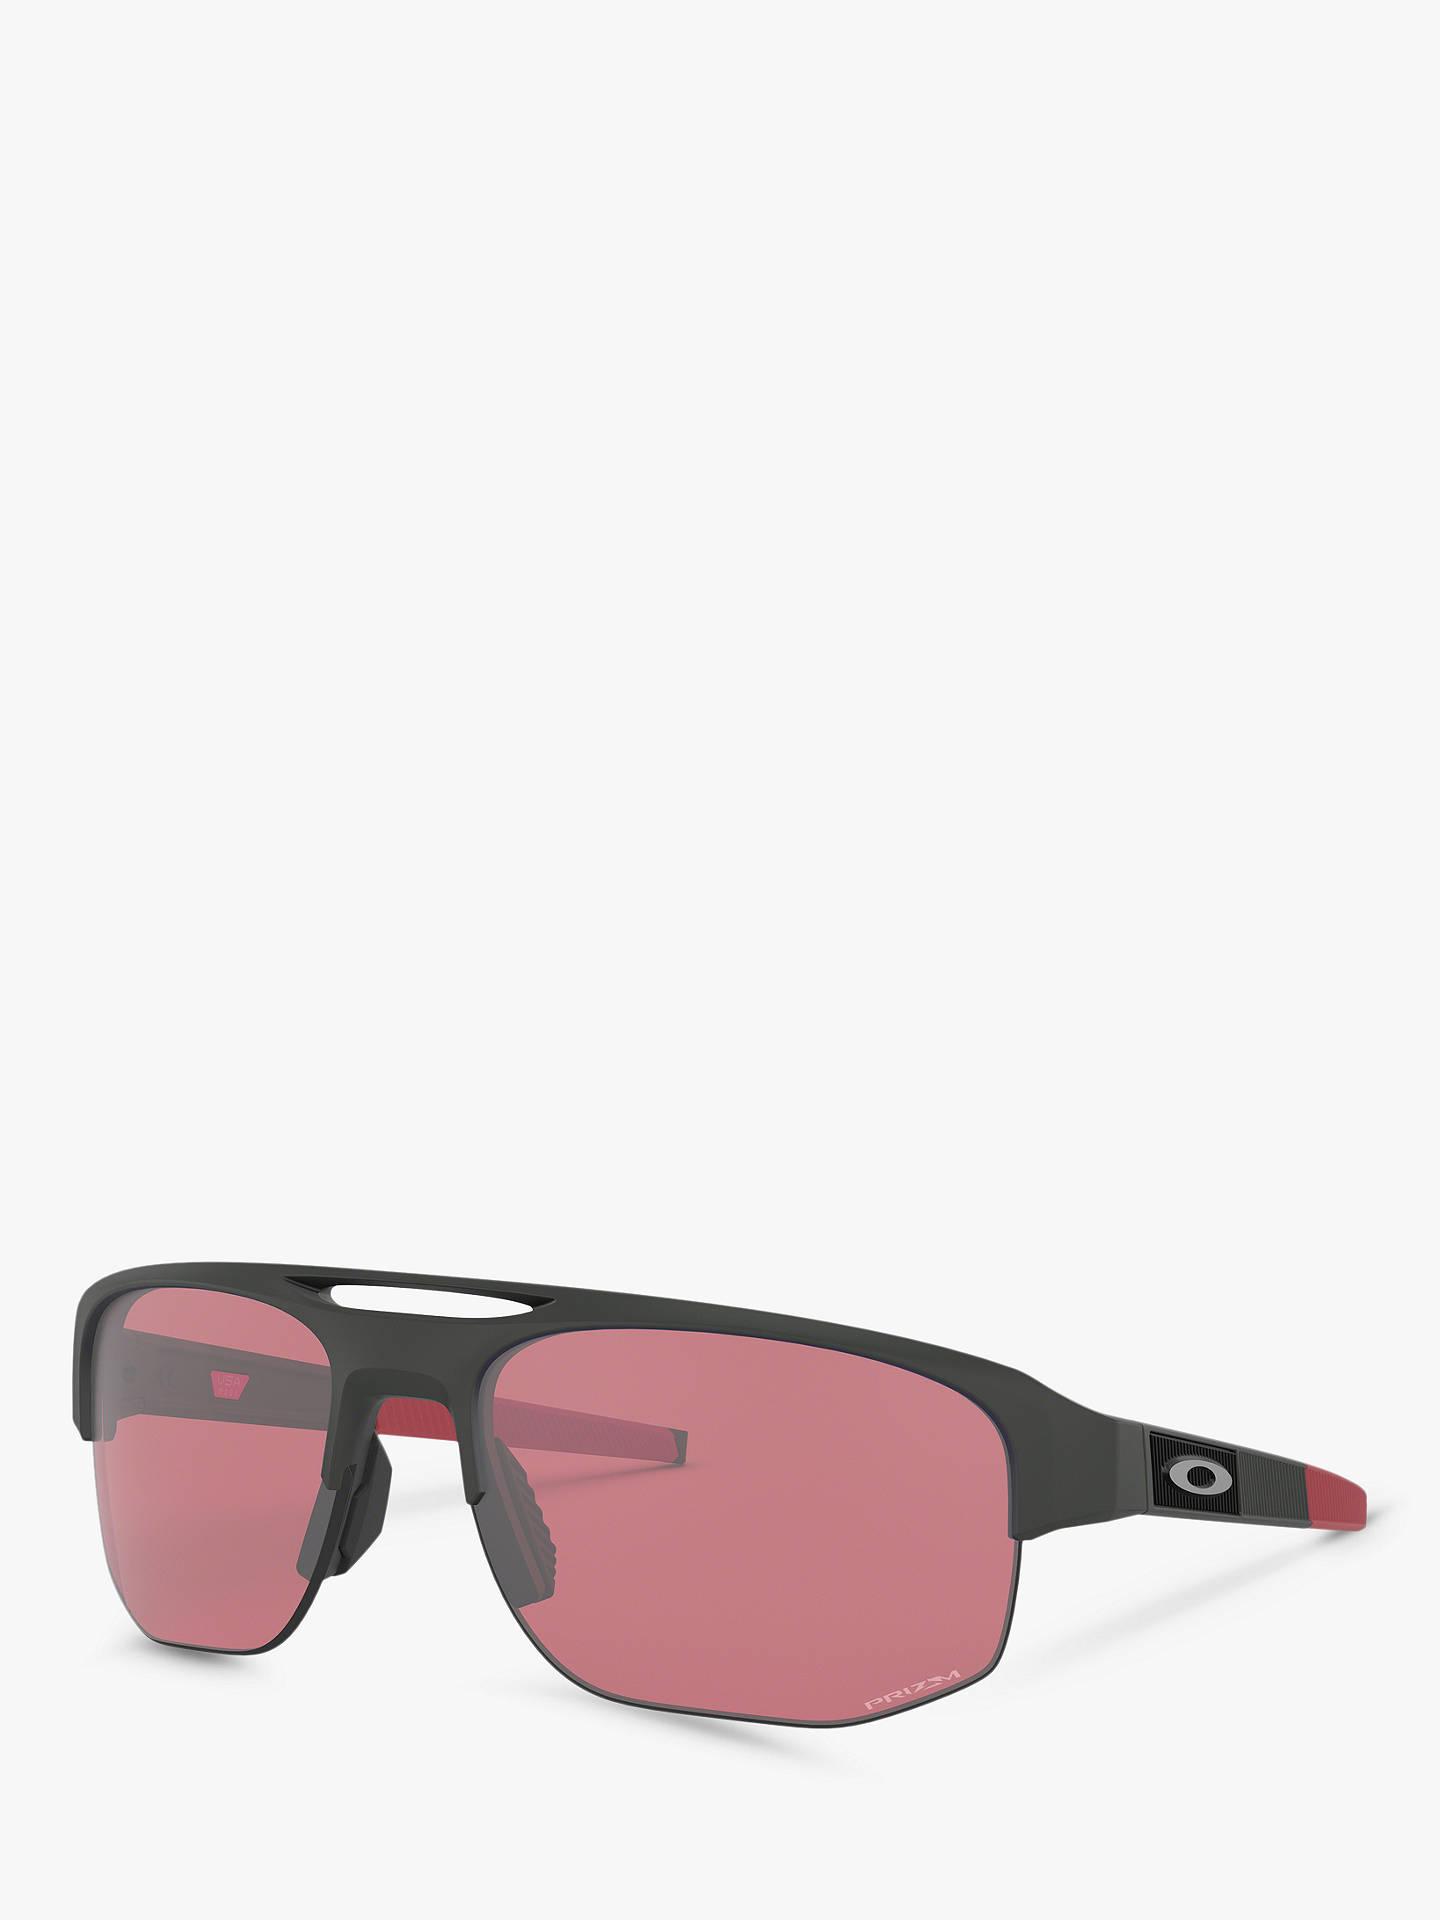 3b51c48a4e30 Buy Oakley OO9424 Men s Mercenary Prizm Rectangular Sunglasses